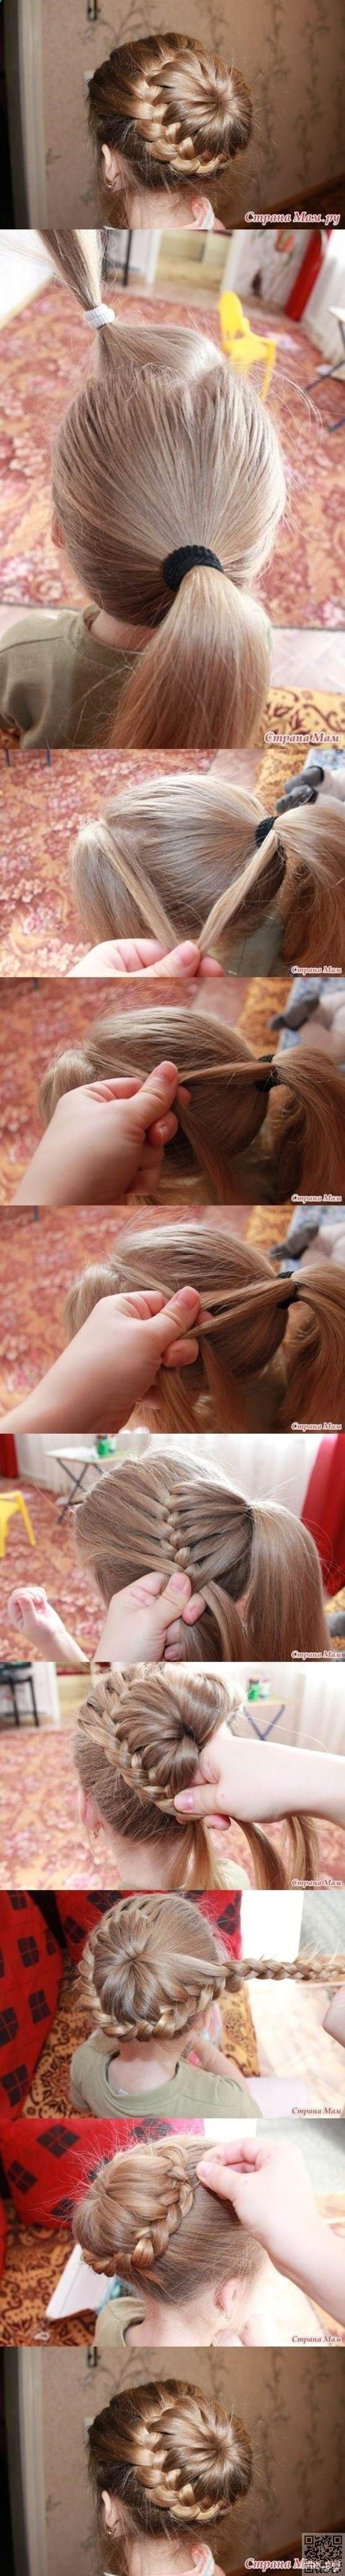 26. #Ballerina Bun - 43 Fancy #Braided Hairstyle #Ideas from Pinterest ... → Hair #Braid